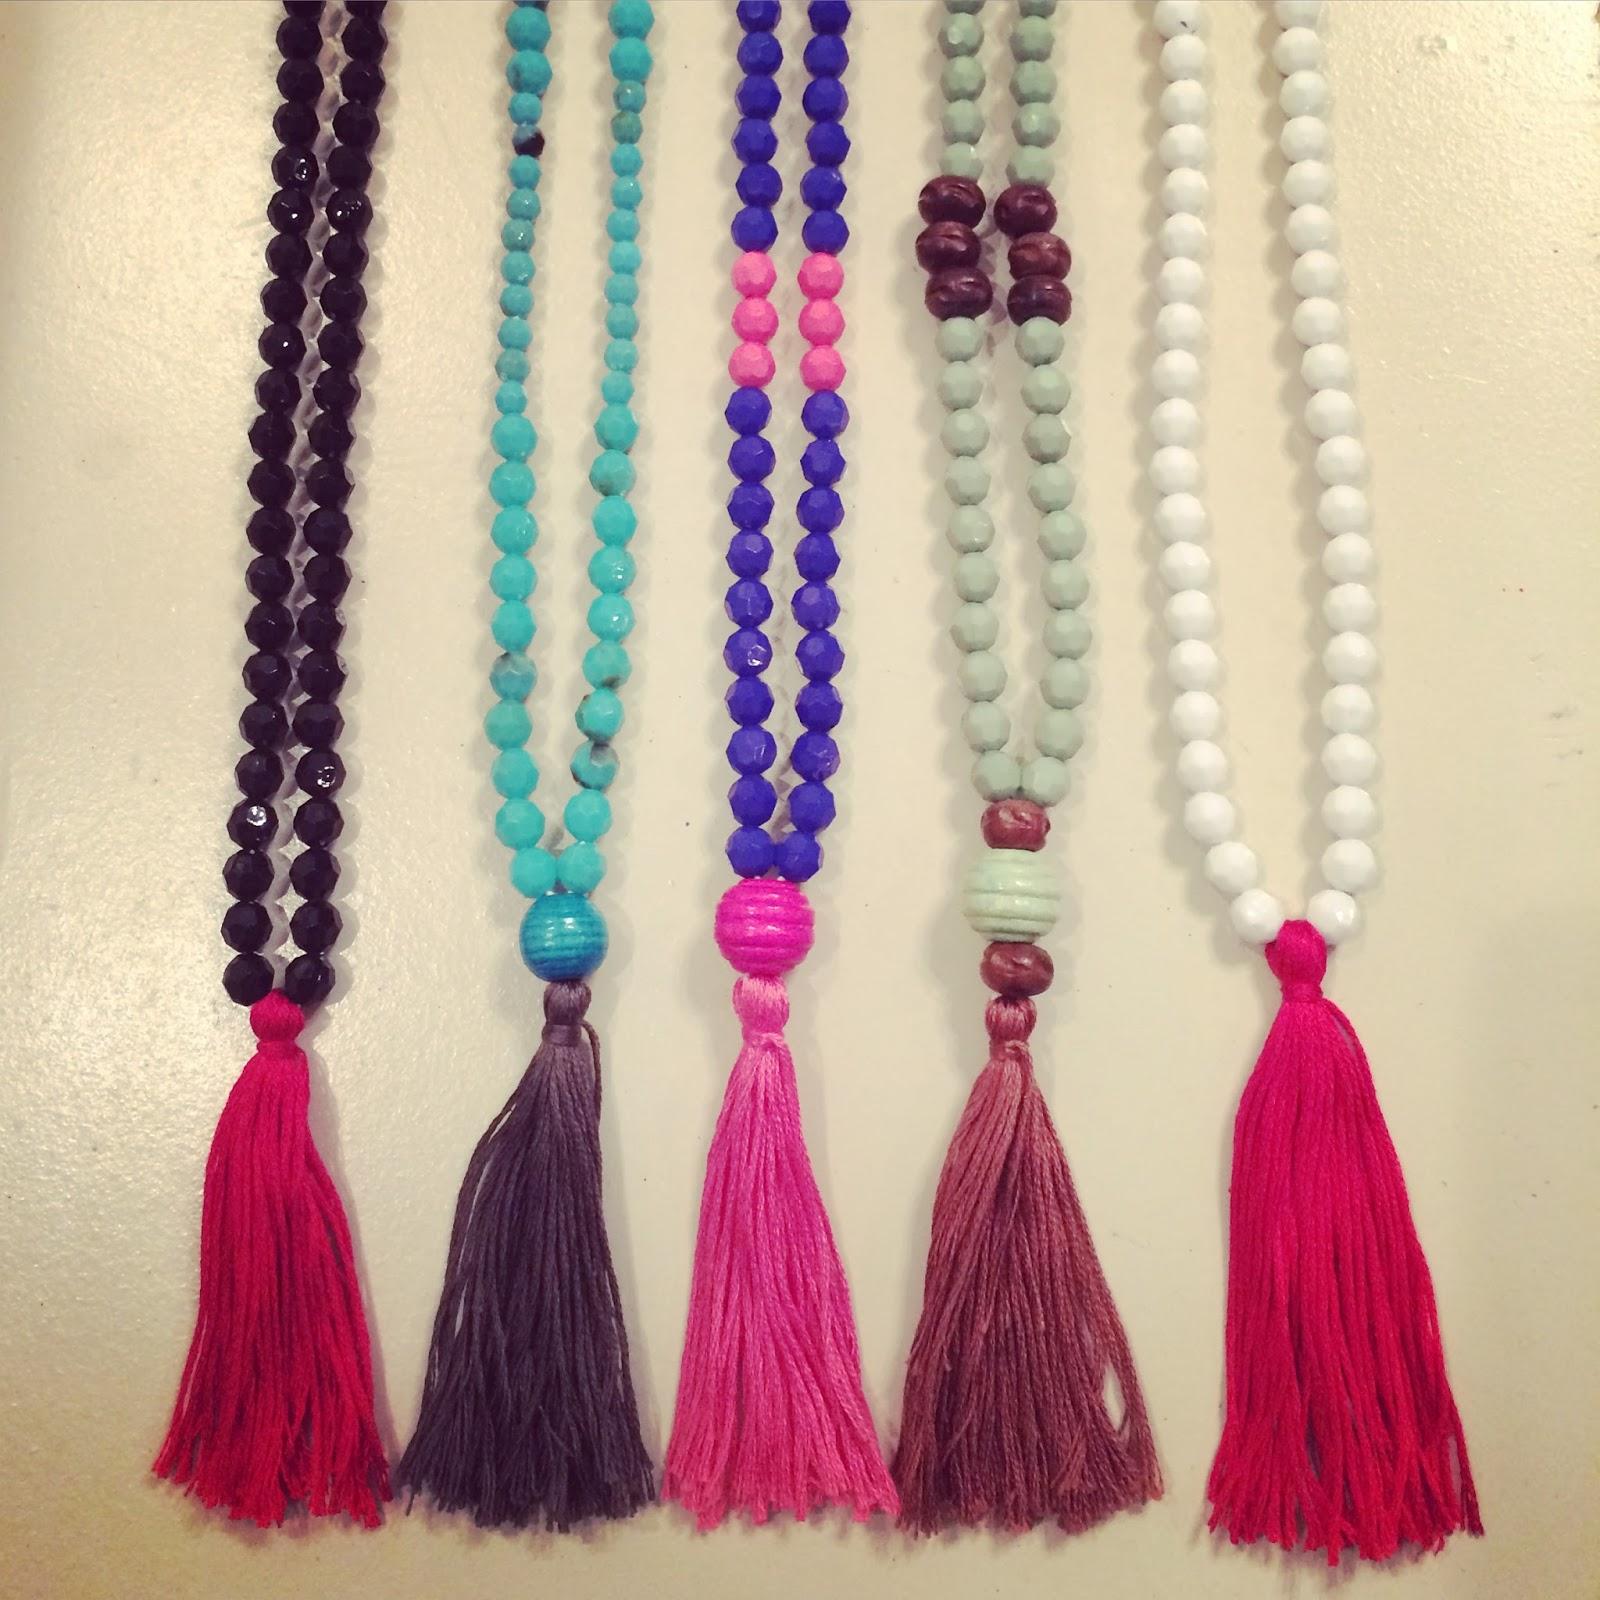 magnolia mamas diy tassel necklaces tutorial. Black Bedroom Furniture Sets. Home Design Ideas